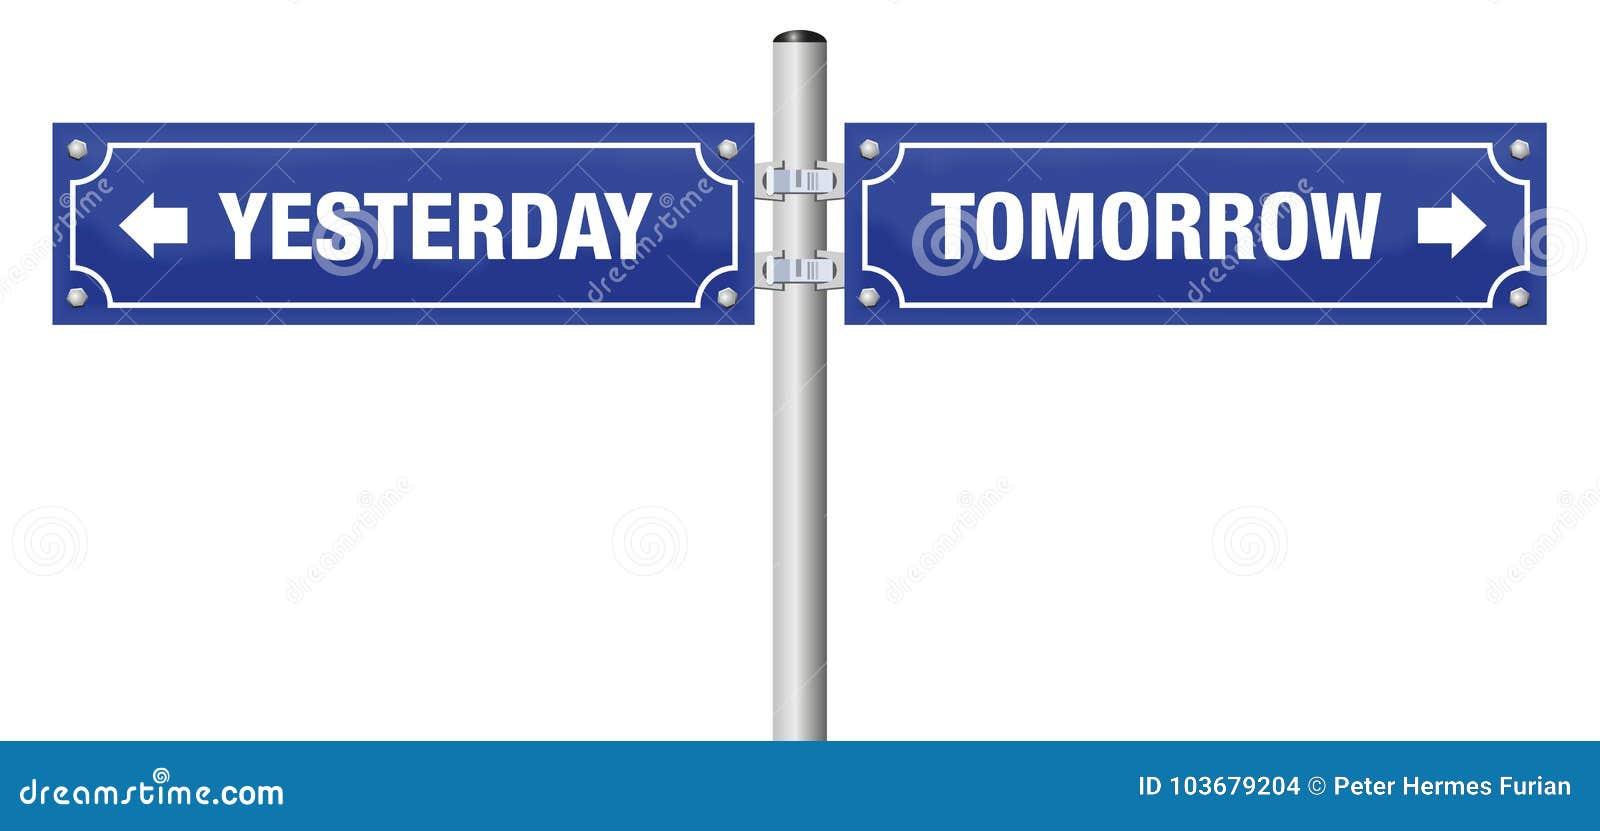 Yesterday Tomorrow Street Sign Stock Vector Illustration Of